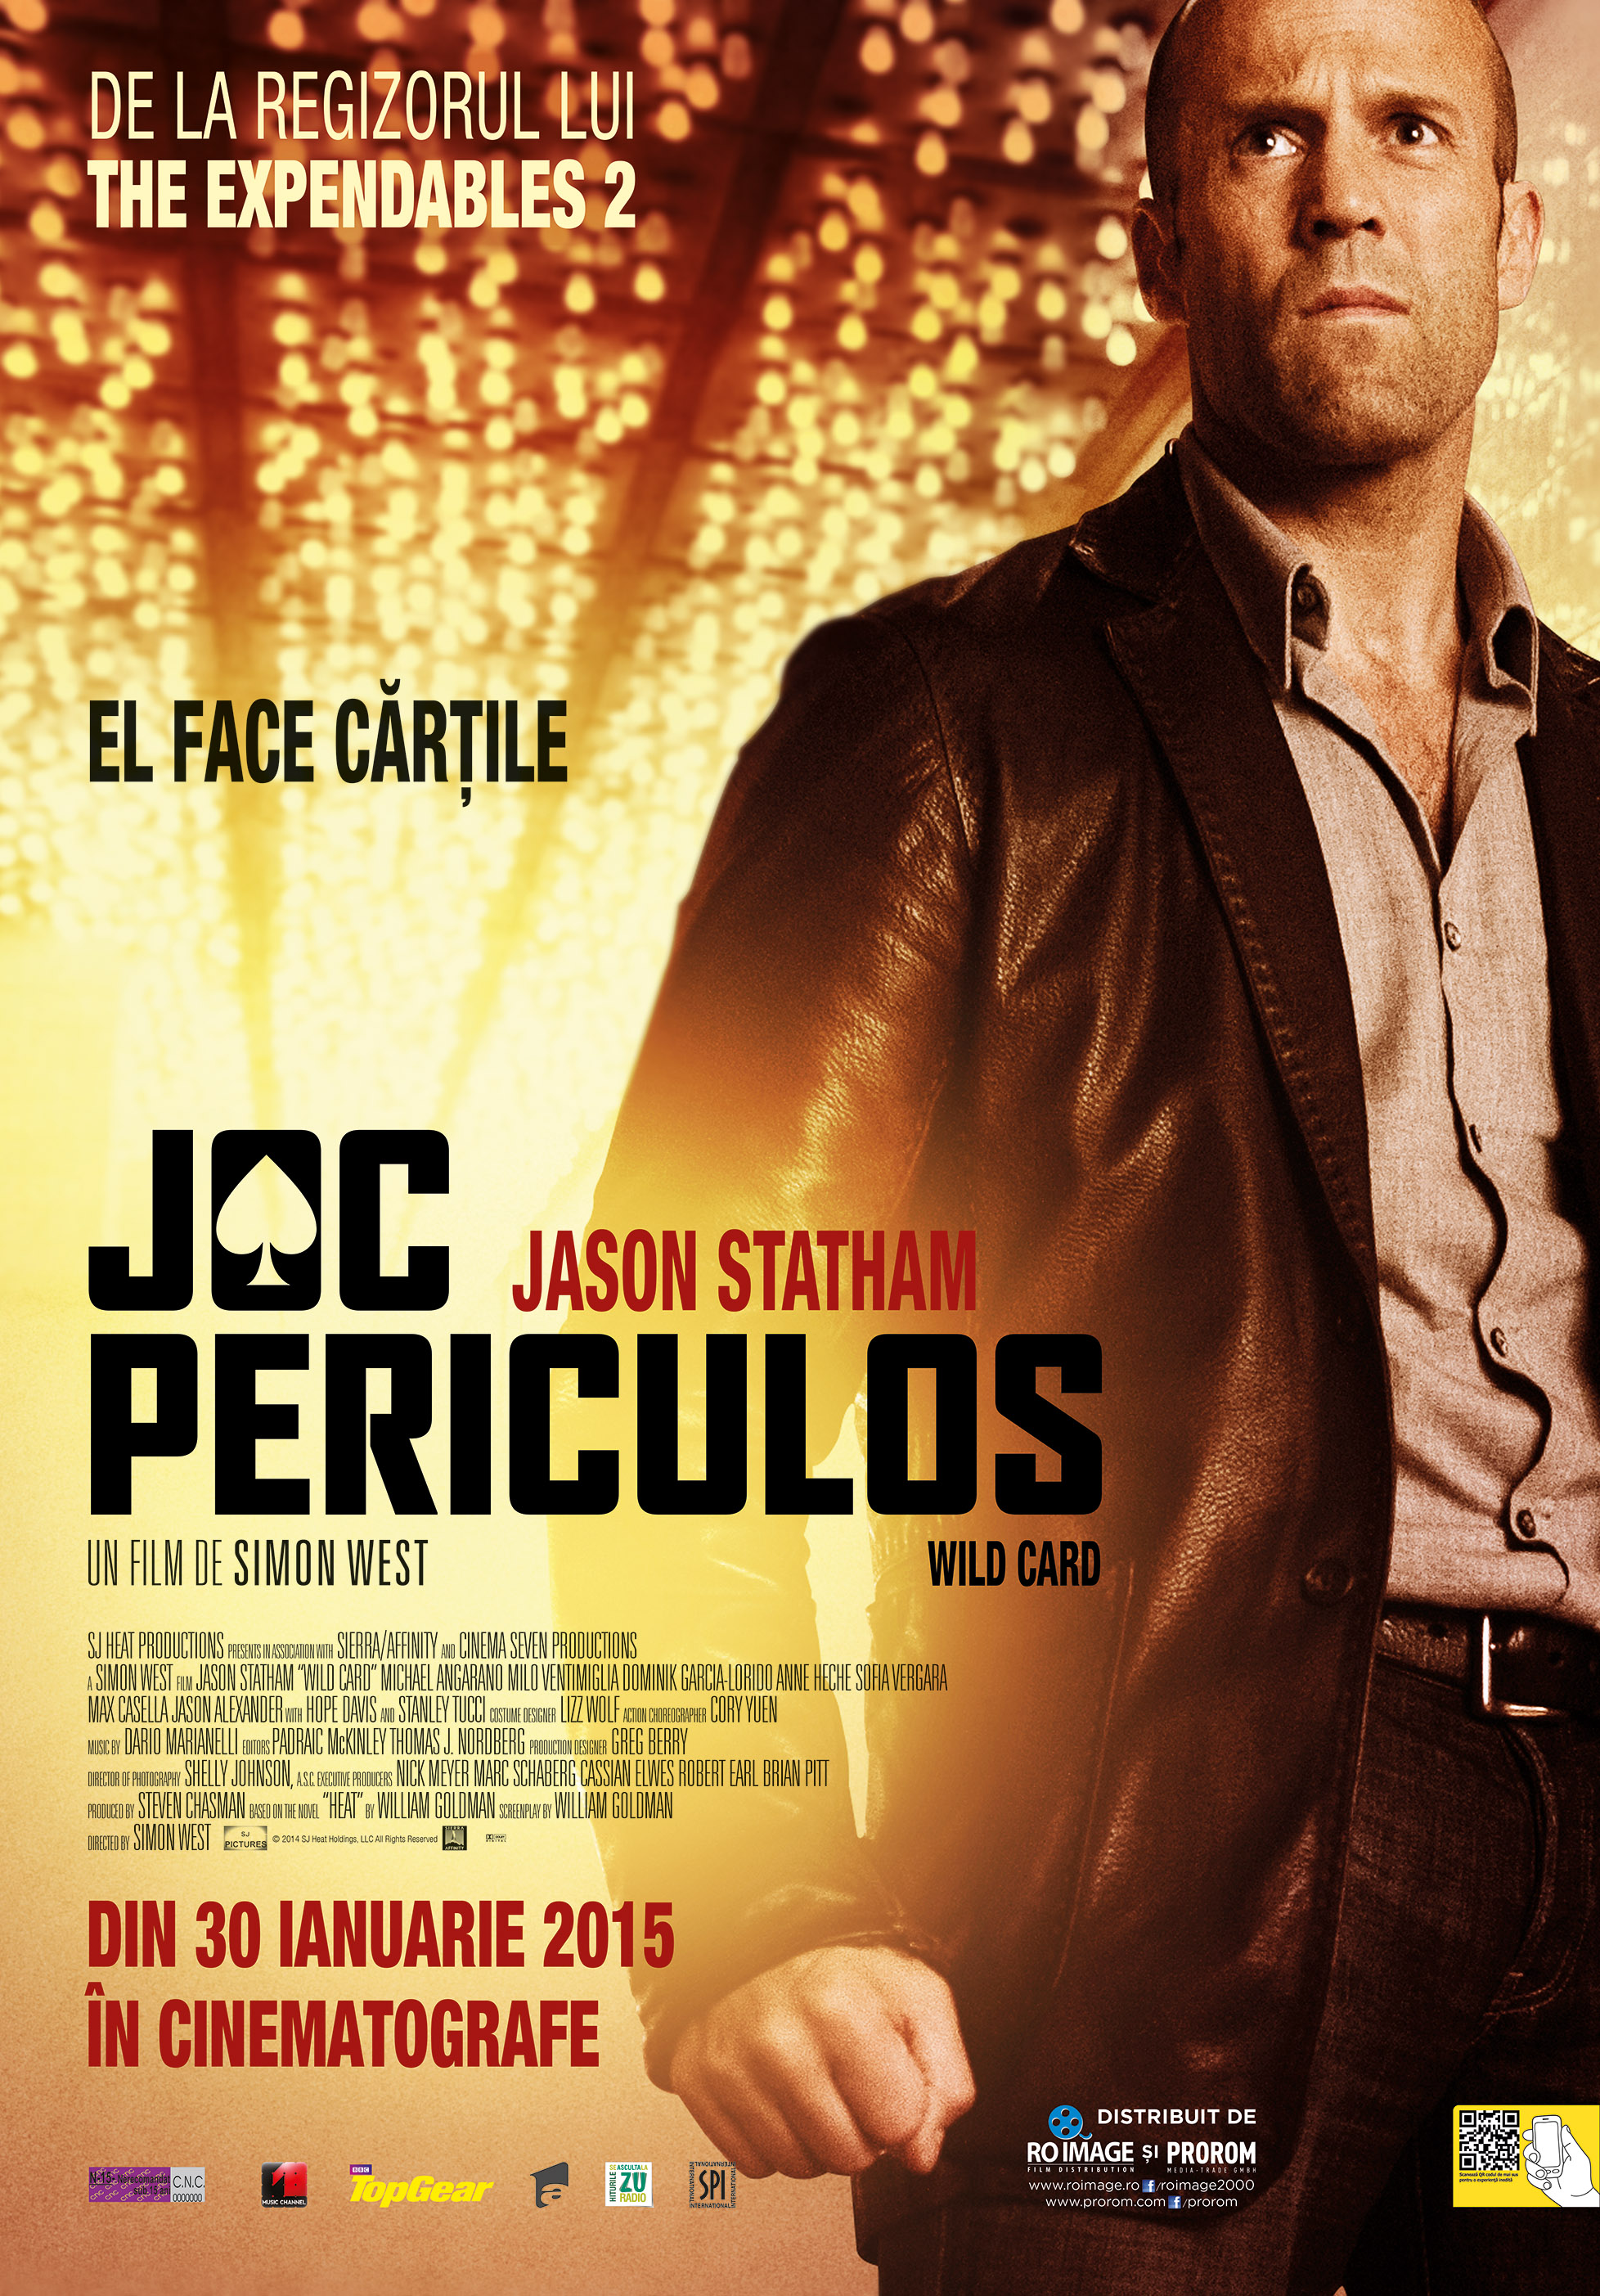 Joc Periculos / Wild Card (Premiera)